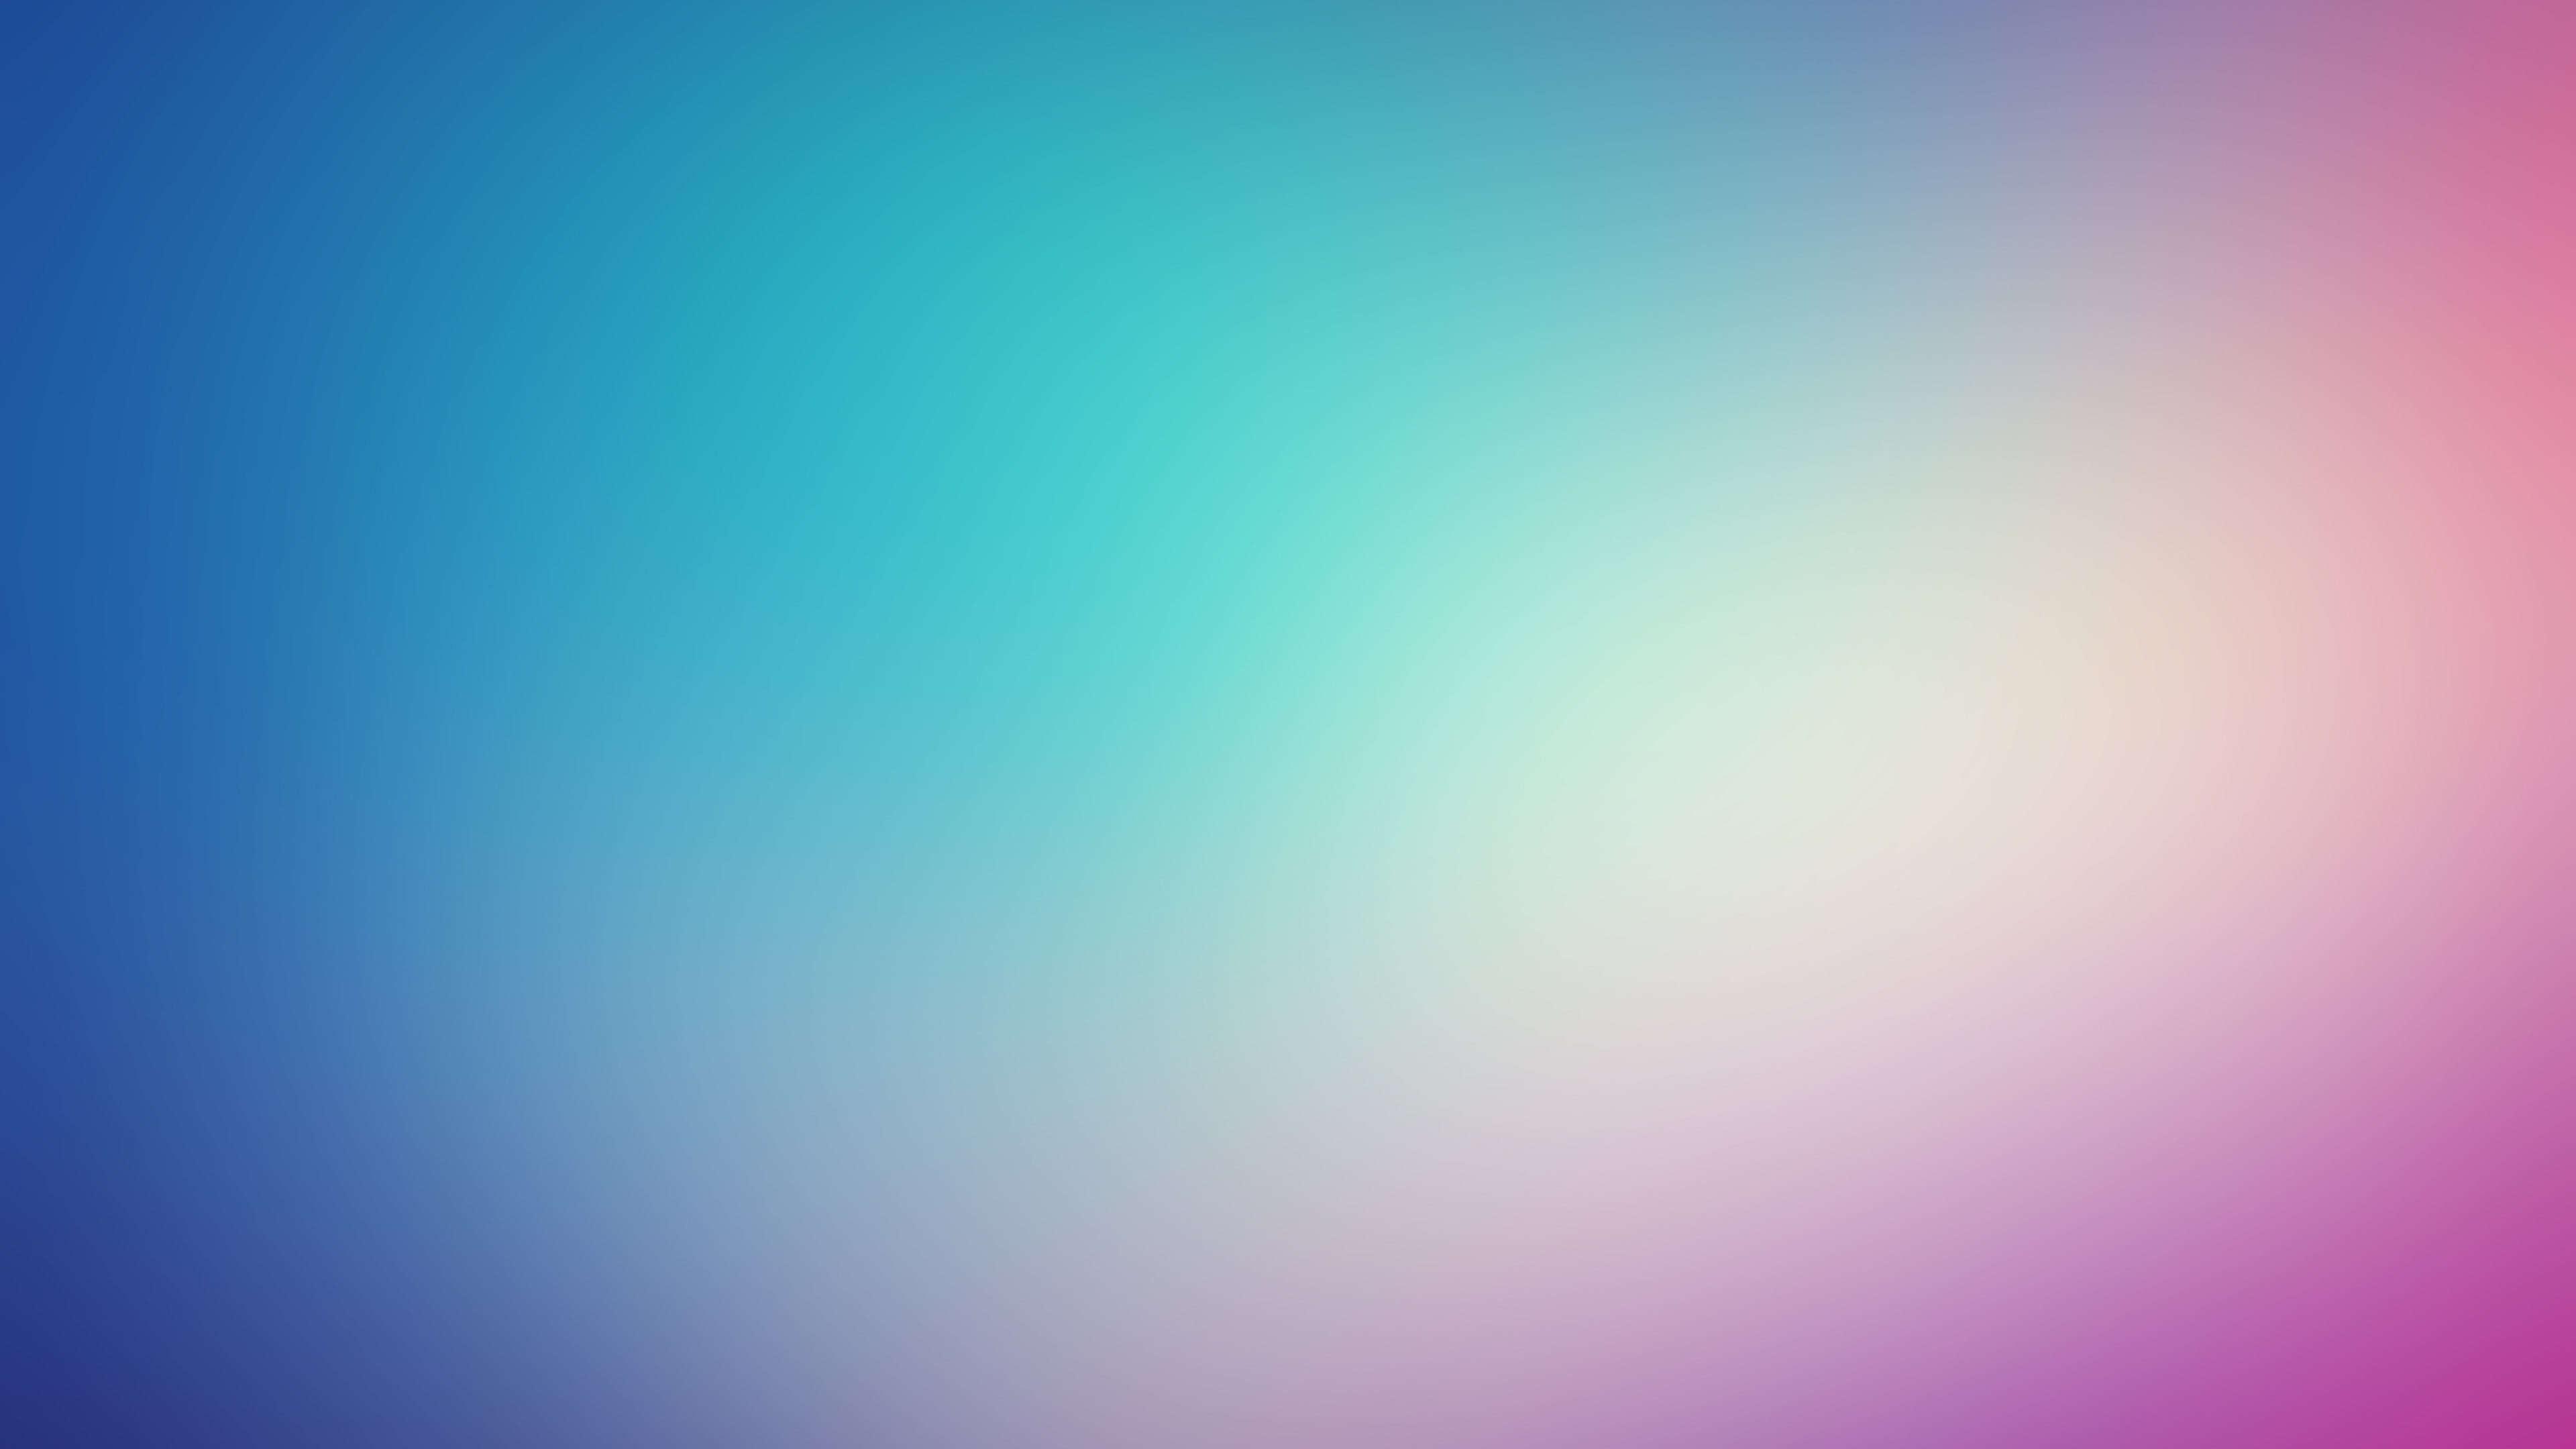 blue pink gradient uhd 4k wallpaper